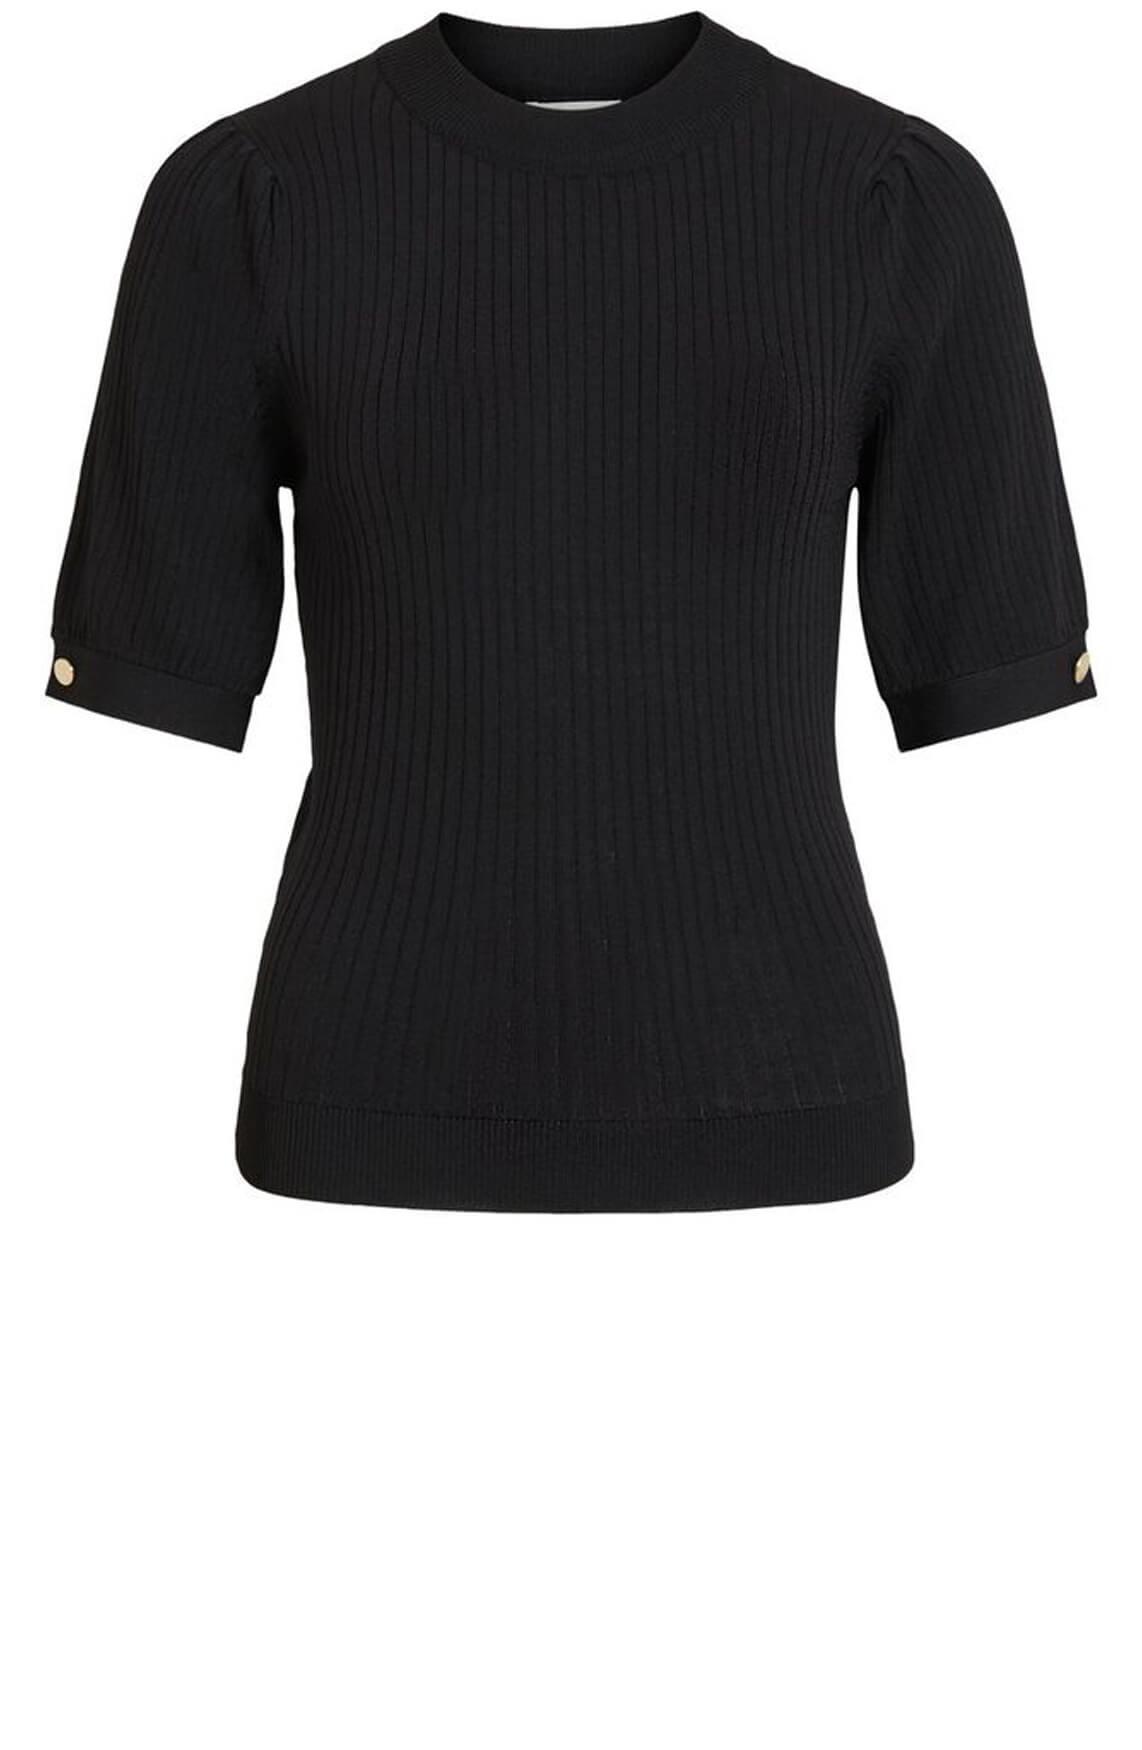 Object Dames Ribgebreide trui zwart